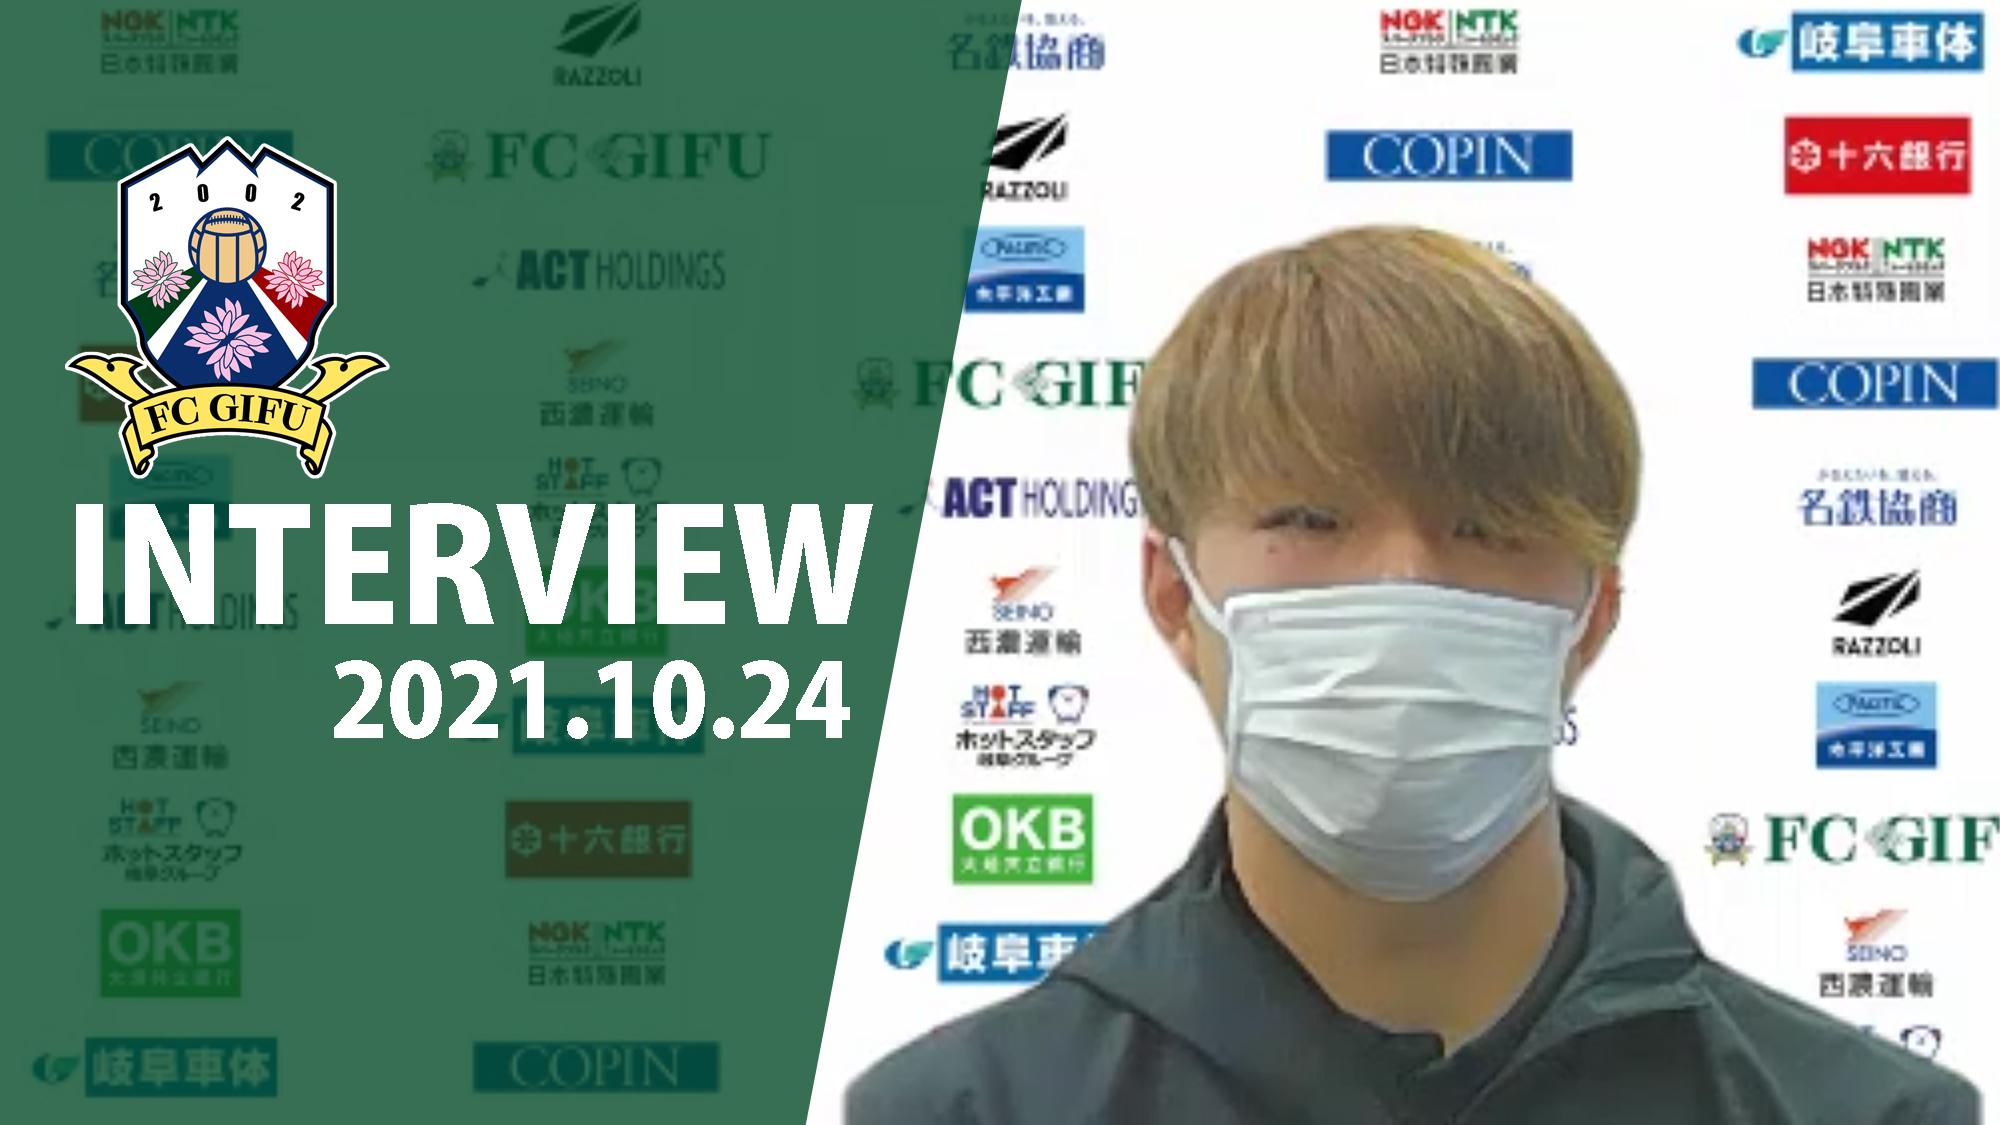 【FC岐阜】窪田稜選手 AC長野パルセイロ戦囲み取材 10月24日